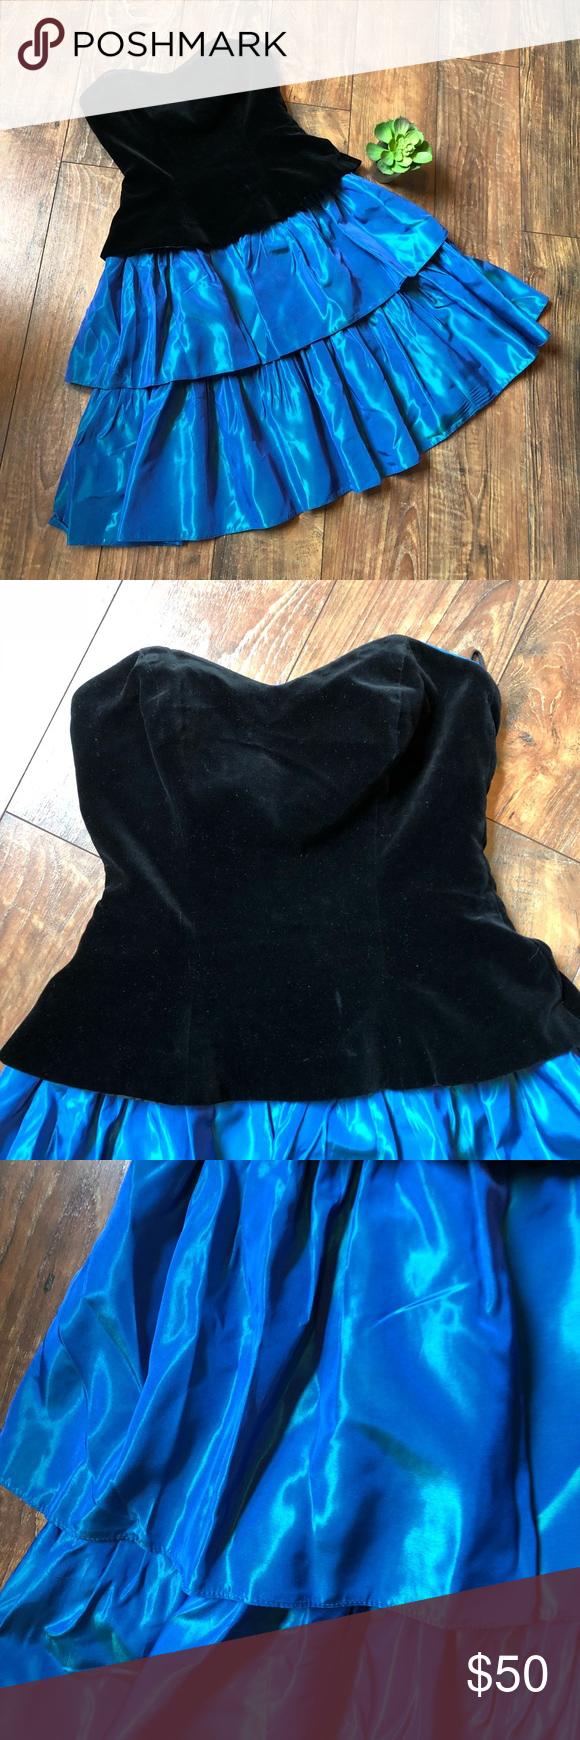 Vintage us prom dress with sweetheart neckline my posh closet